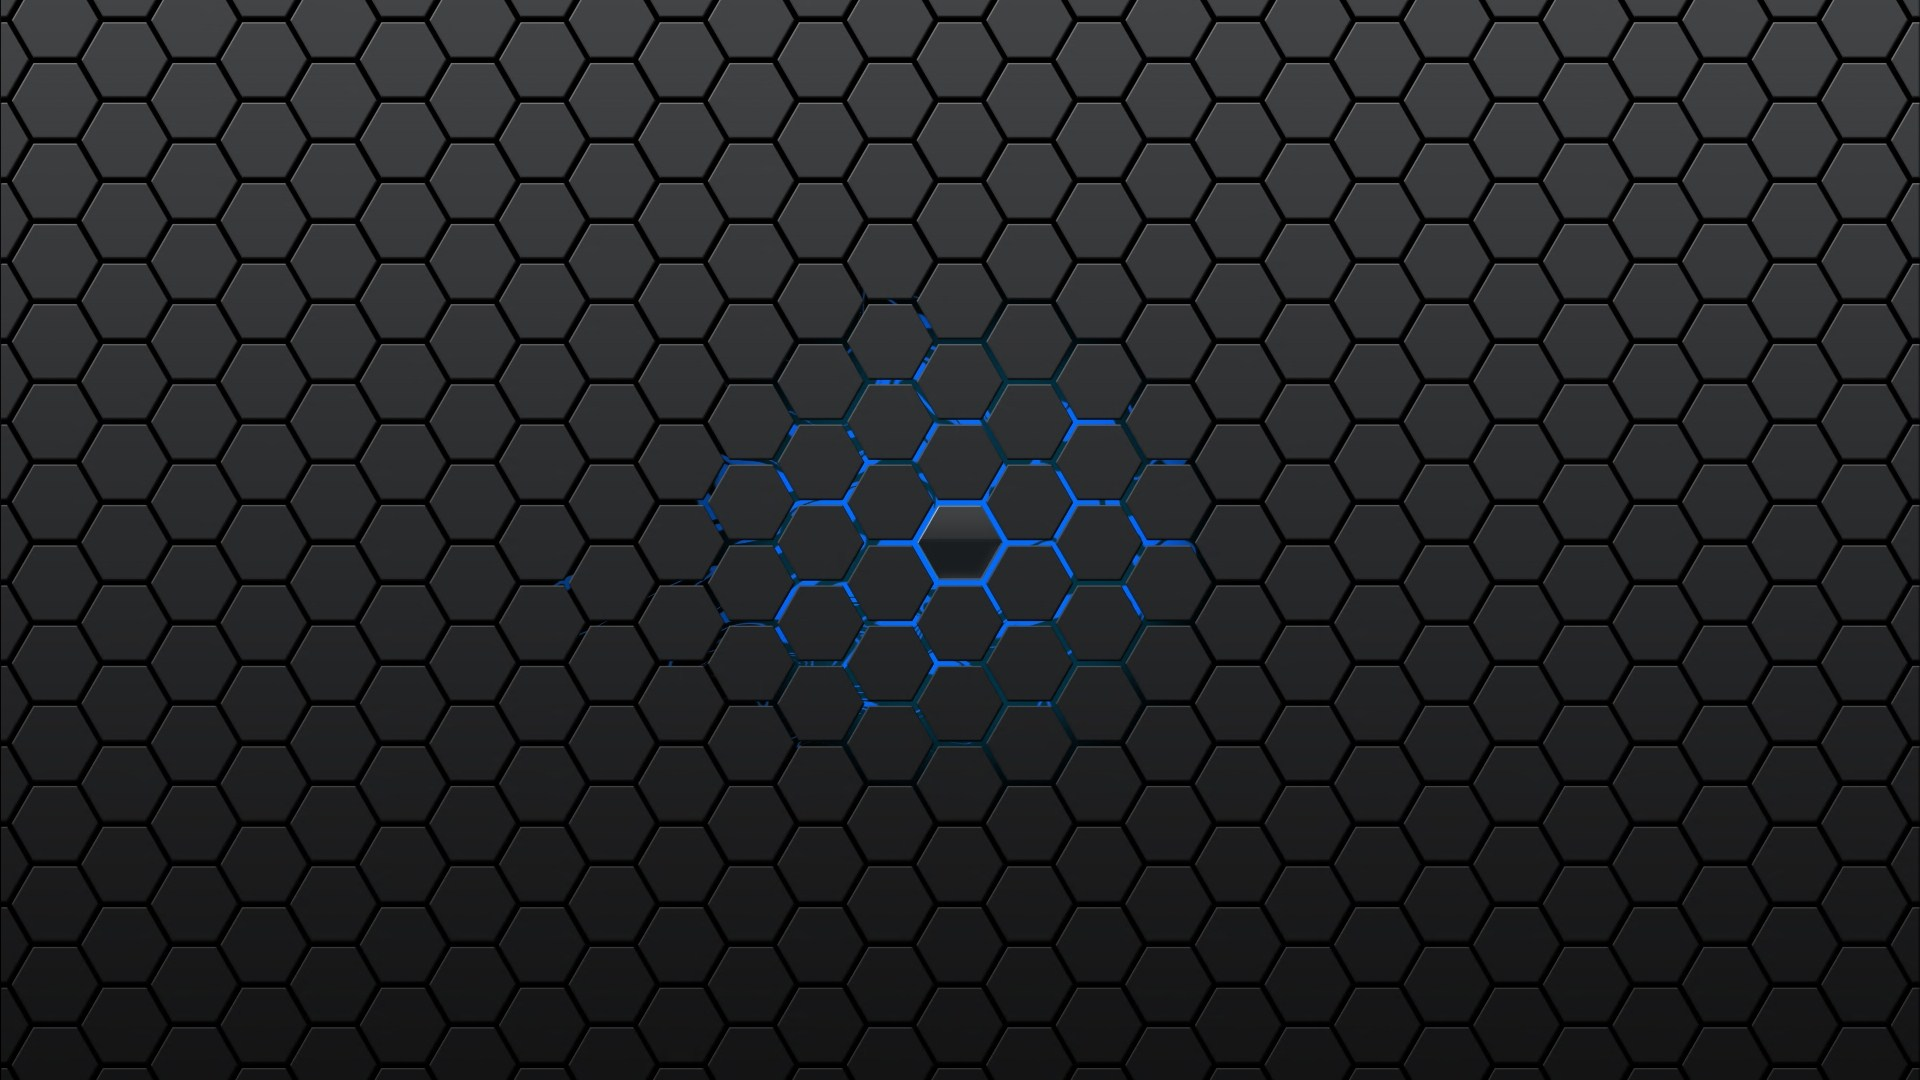 Abstract pattern hd black wallpaper wallpaper 1920x1080 196178 1920x1080